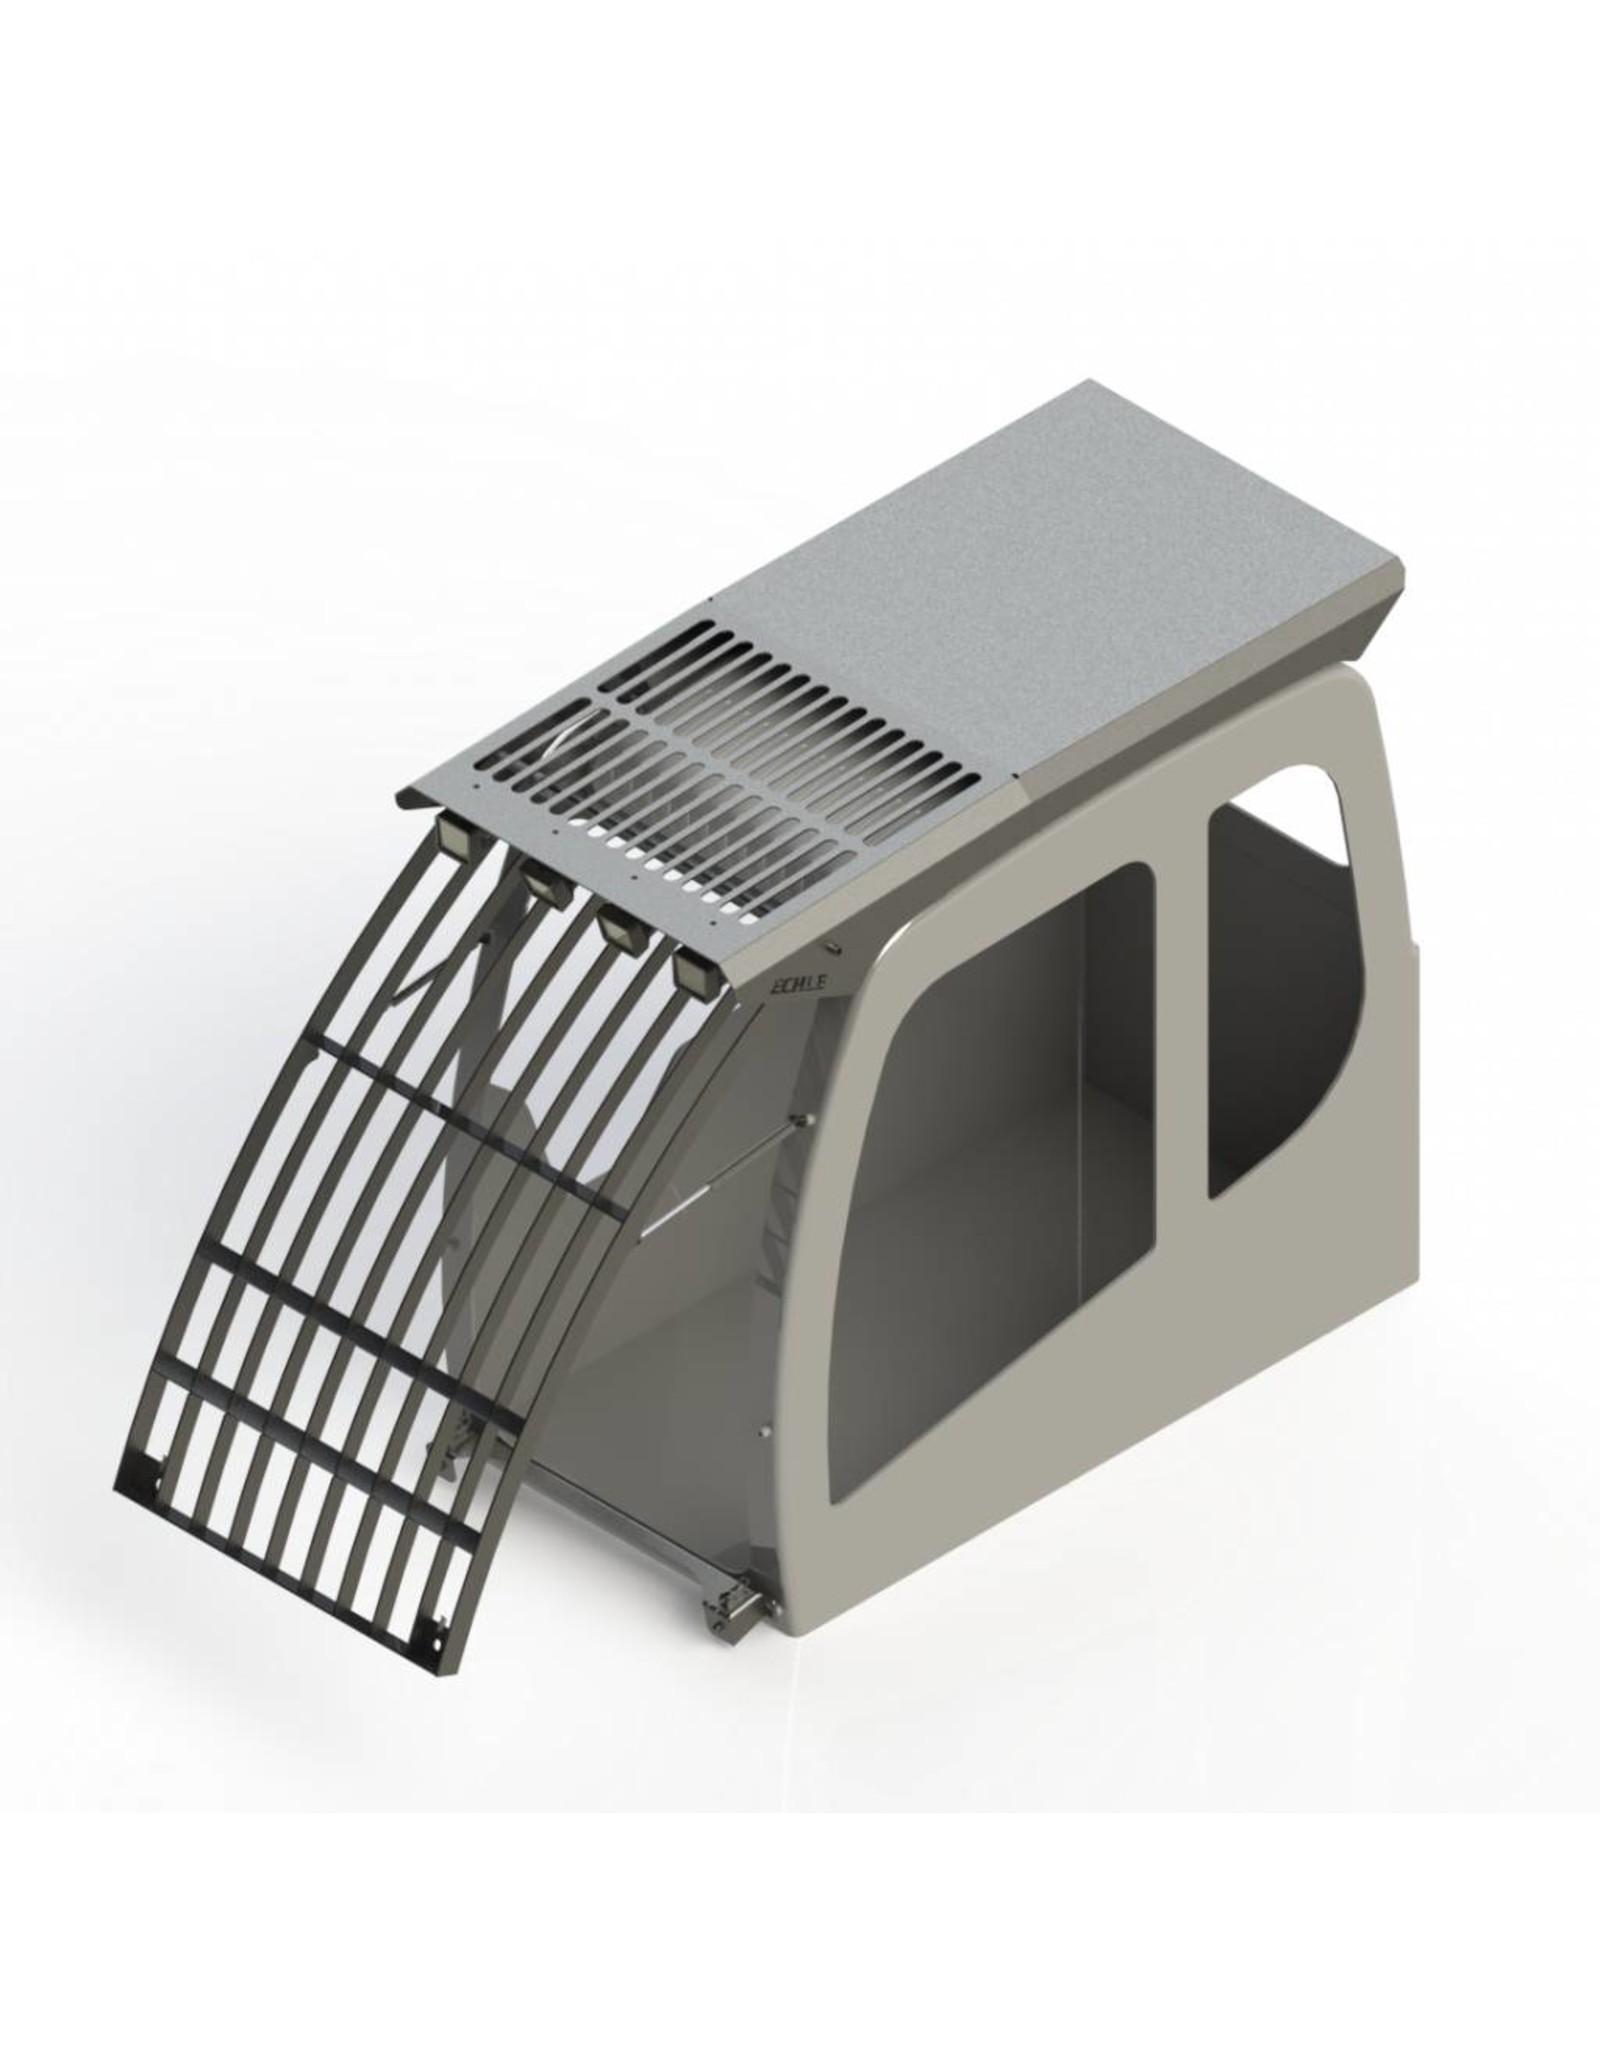 Echle Hartstahl GmbH FOPS für CAT 308E2